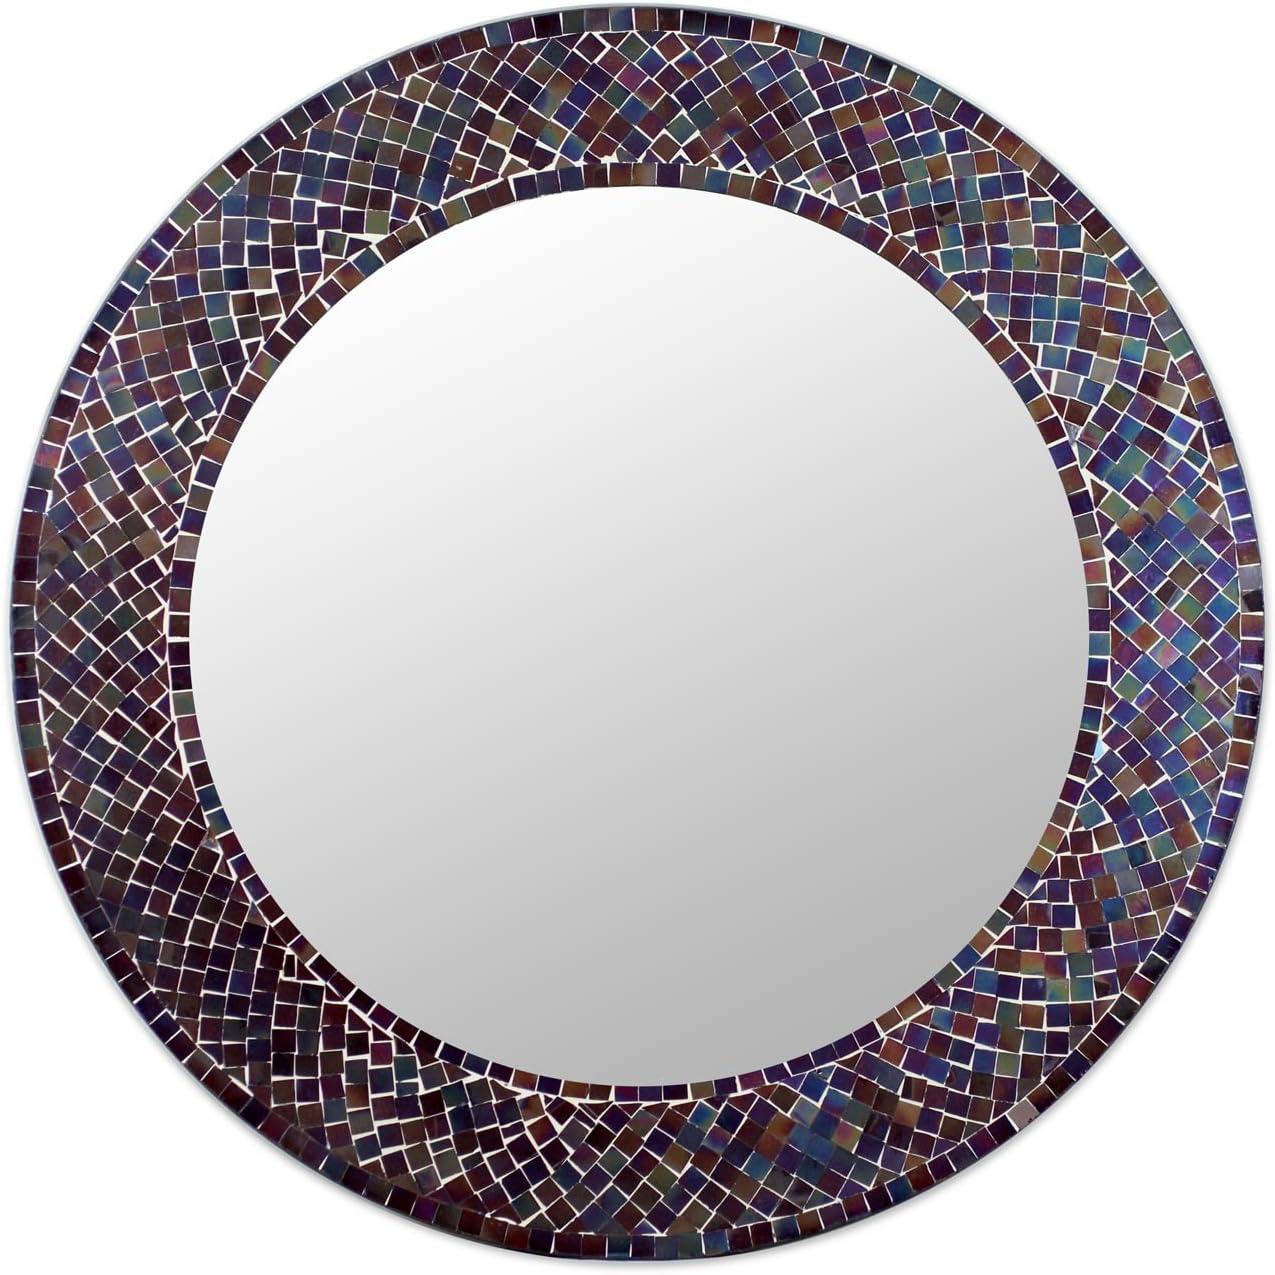 NOVICA Amethyst Halo Glass Mosaic Wall Mirror